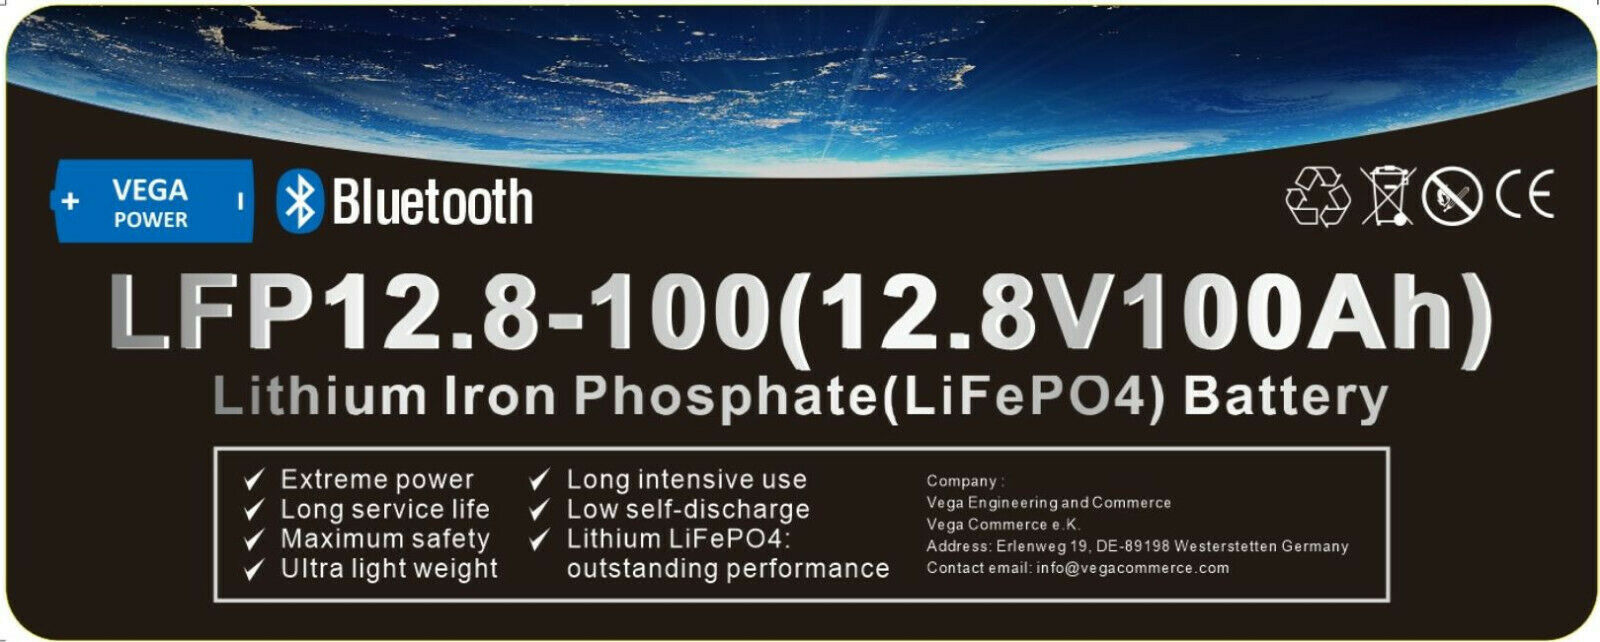 12V-100Ah-LiFePO4-Lithium Eisen Phosphat-Akku-Wohnmobil-Wagen